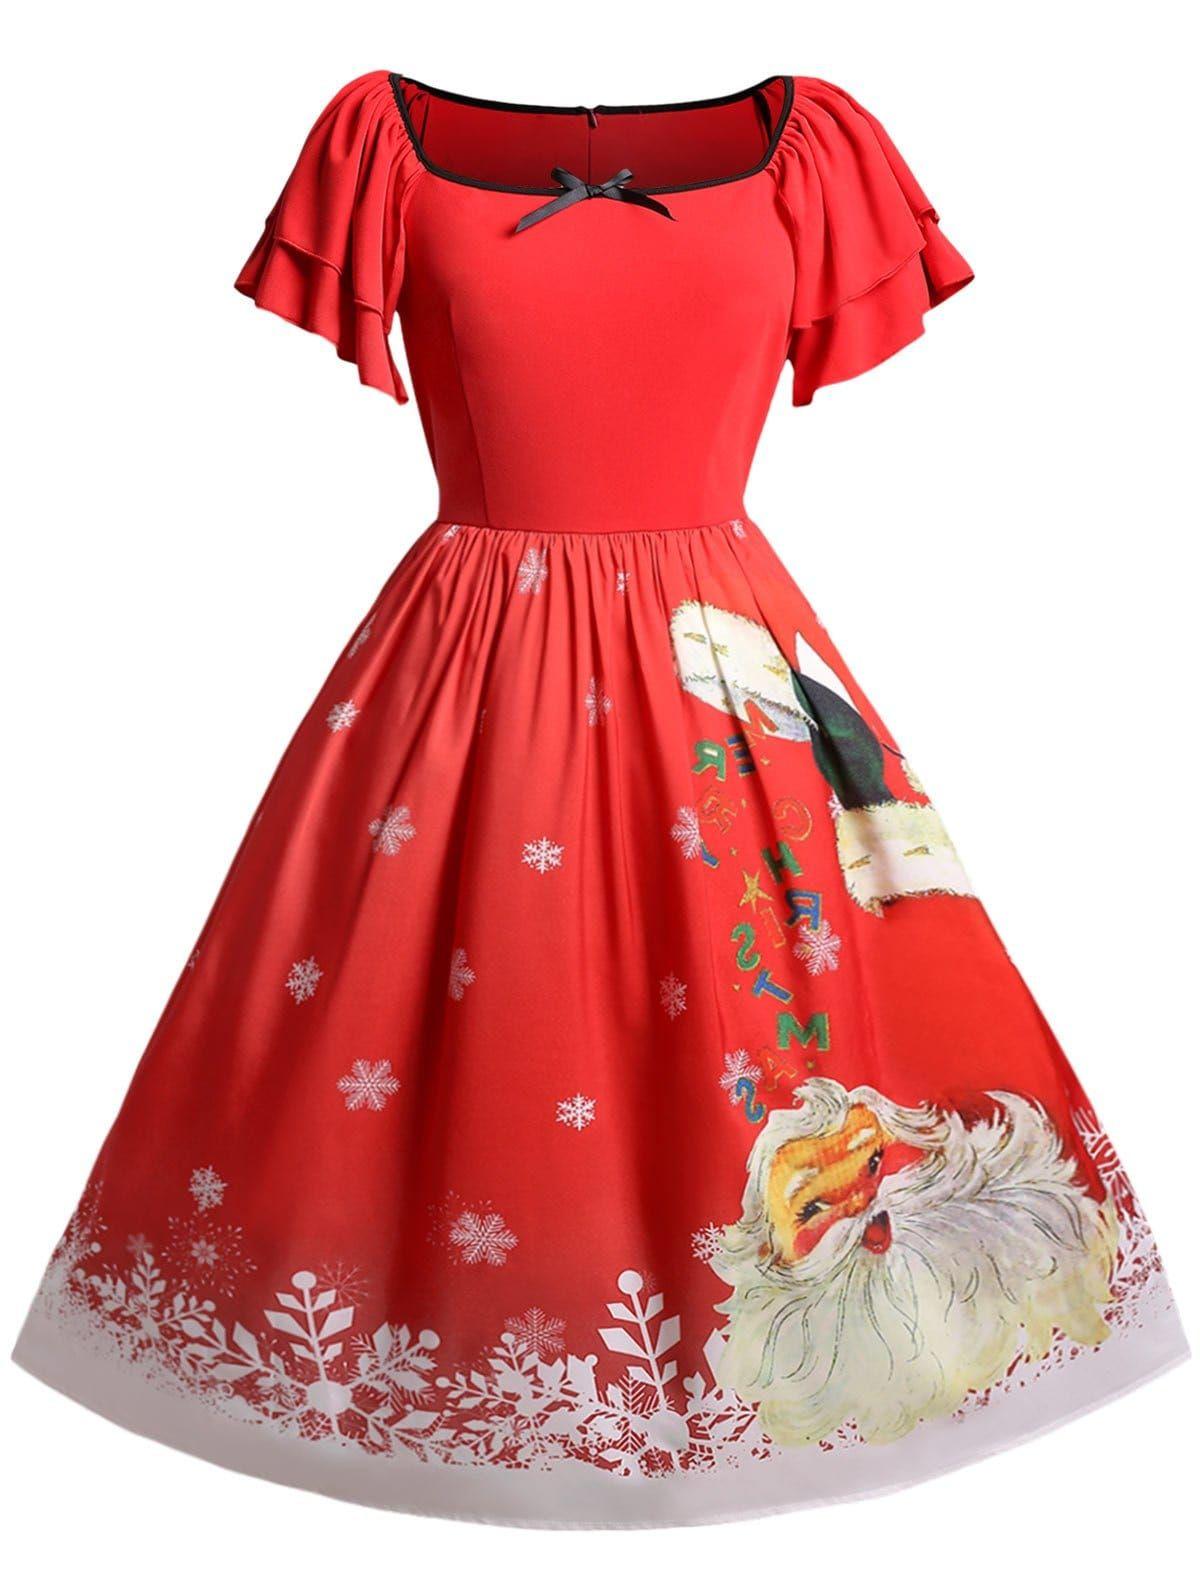 91c87ab8130 Christmas Plus Size Santa Claus Print Vintage Dress